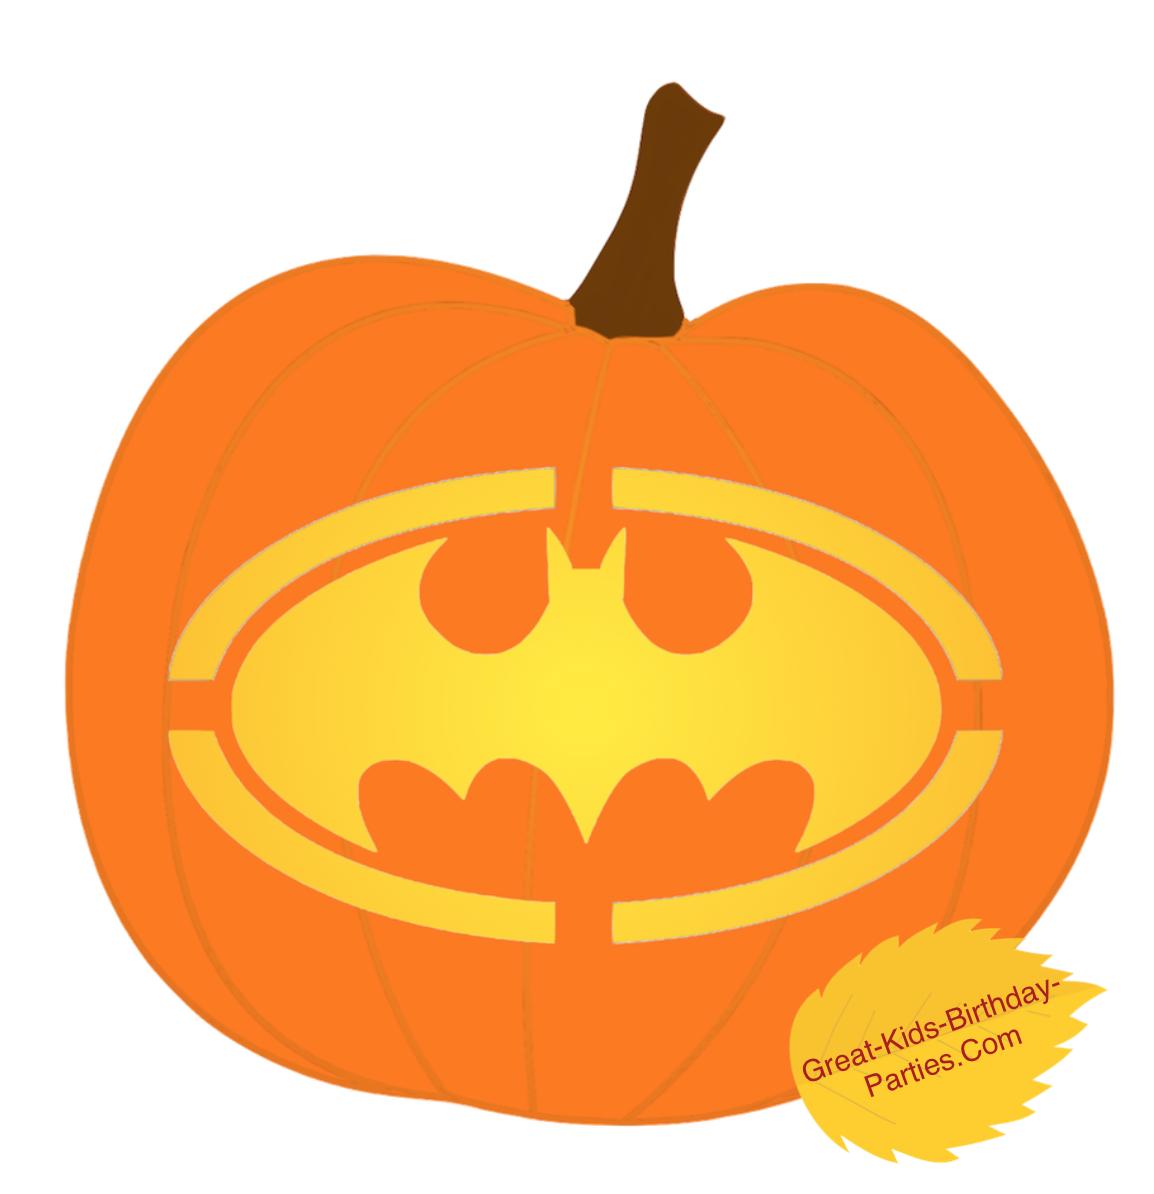 Shopkins pumpkin clipart image freeuse library Pumpkin Stencils image freeuse library